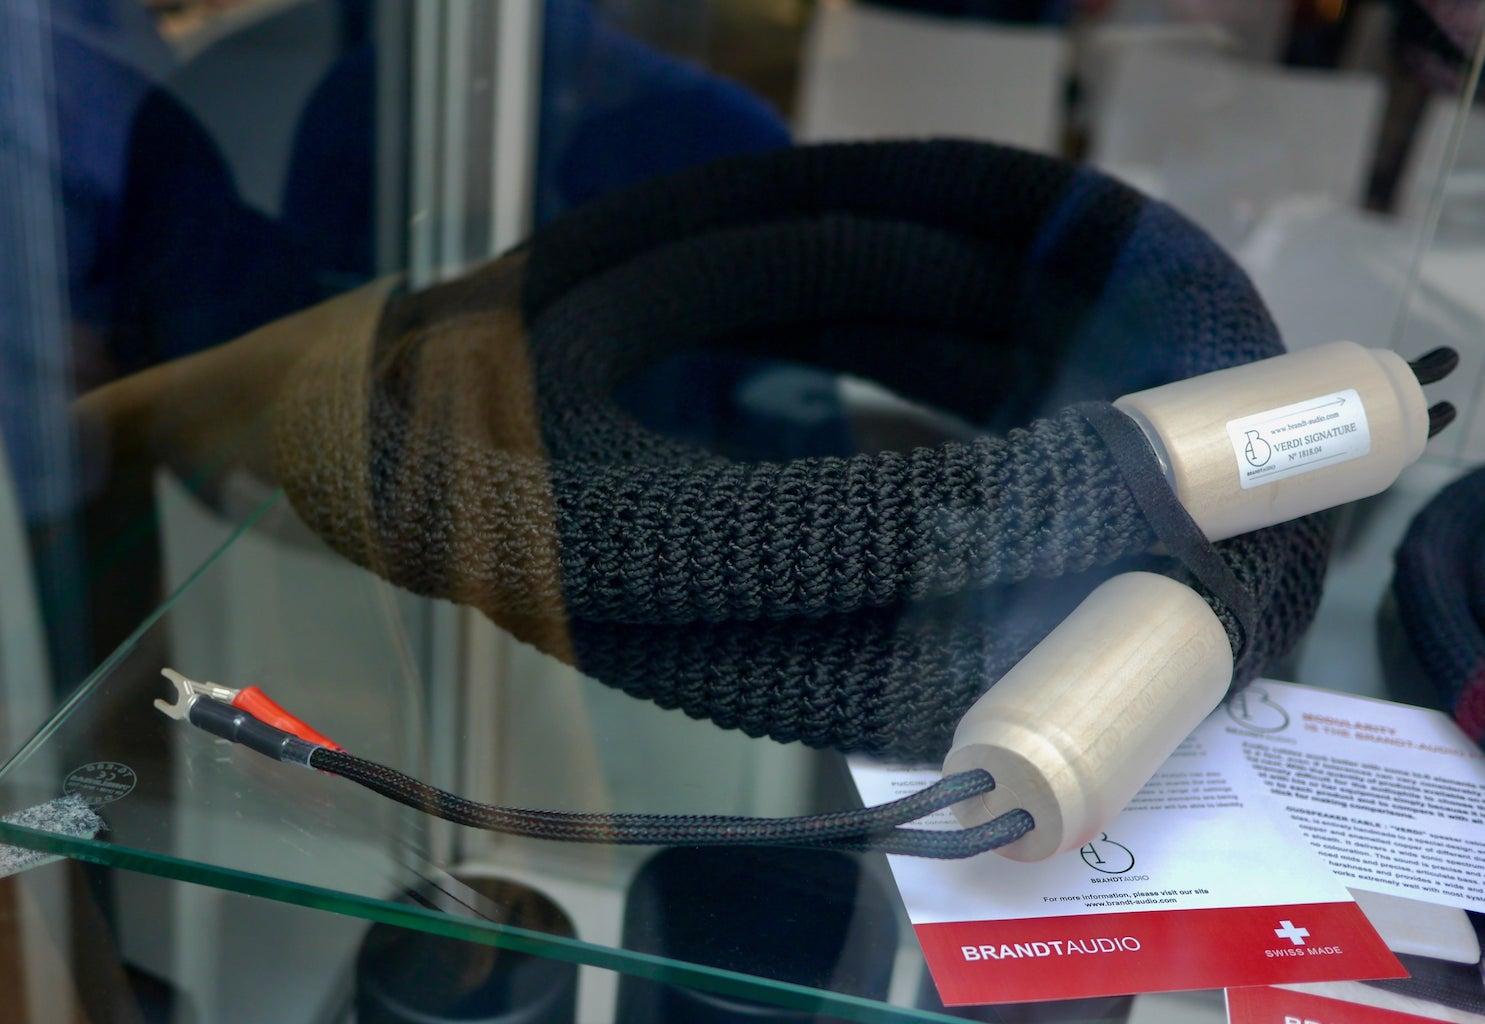 Dicke Lautsprecherkabel von Brandt